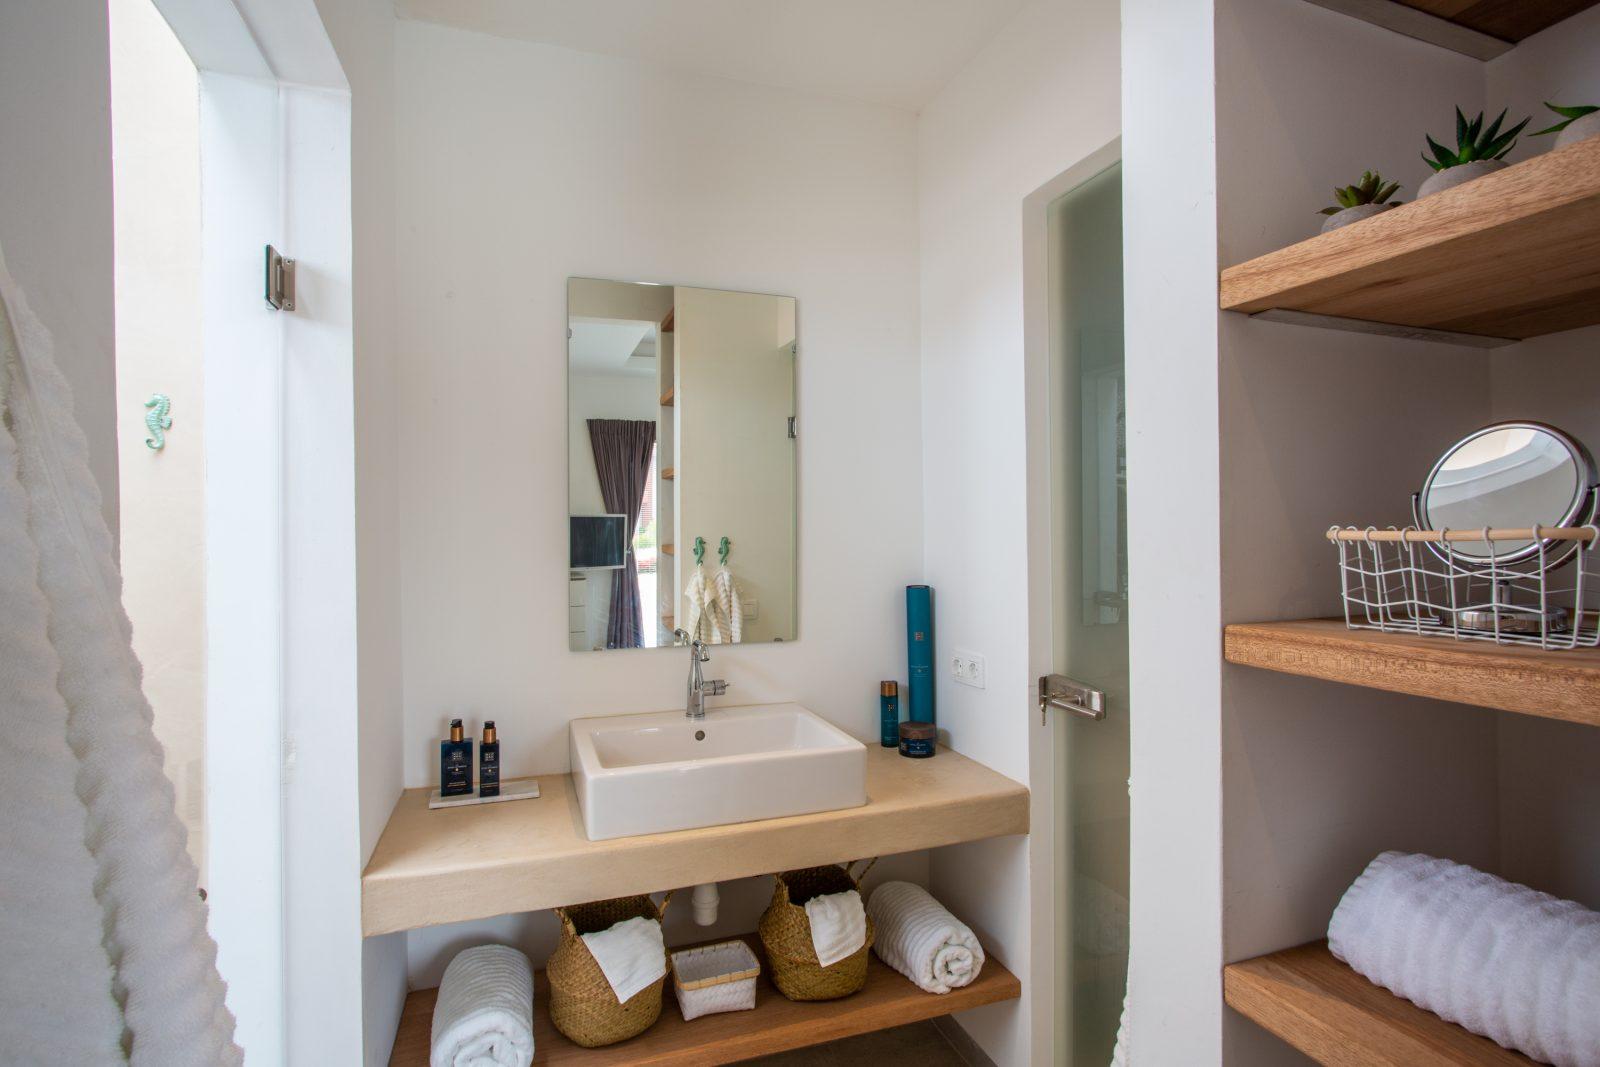 Badkamer met apart toilet La Royal